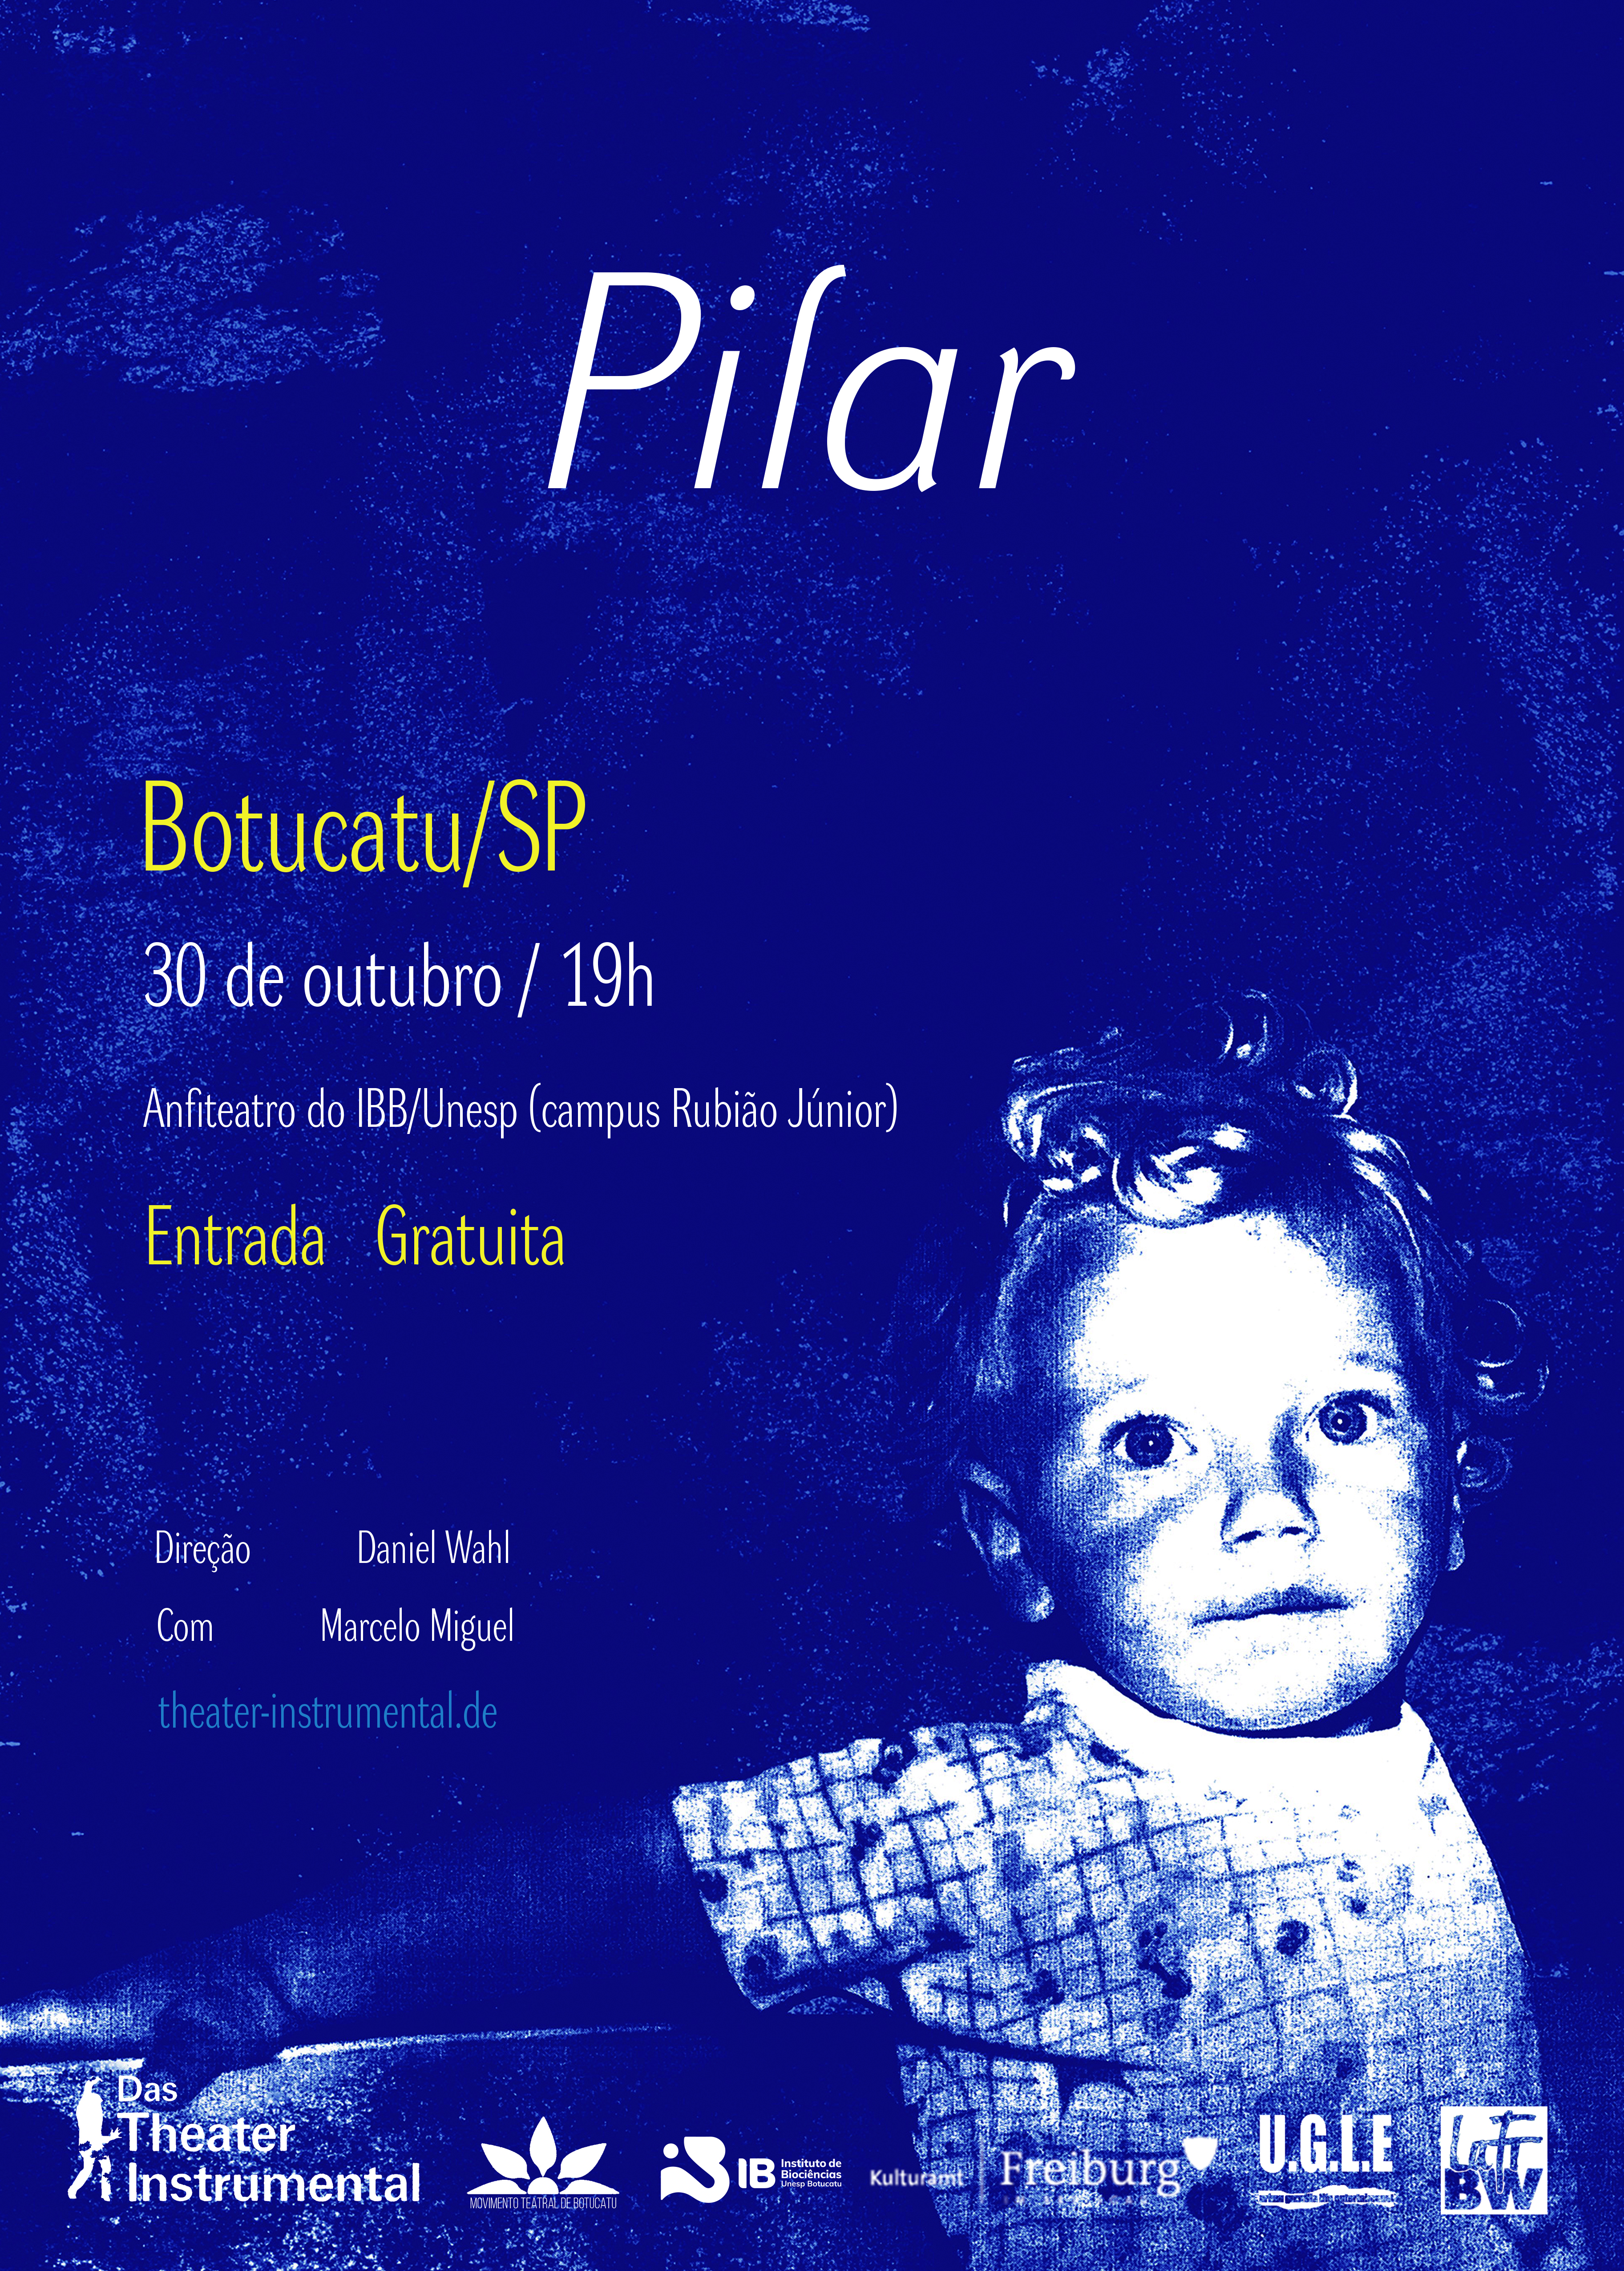 Pilar---Cartaz